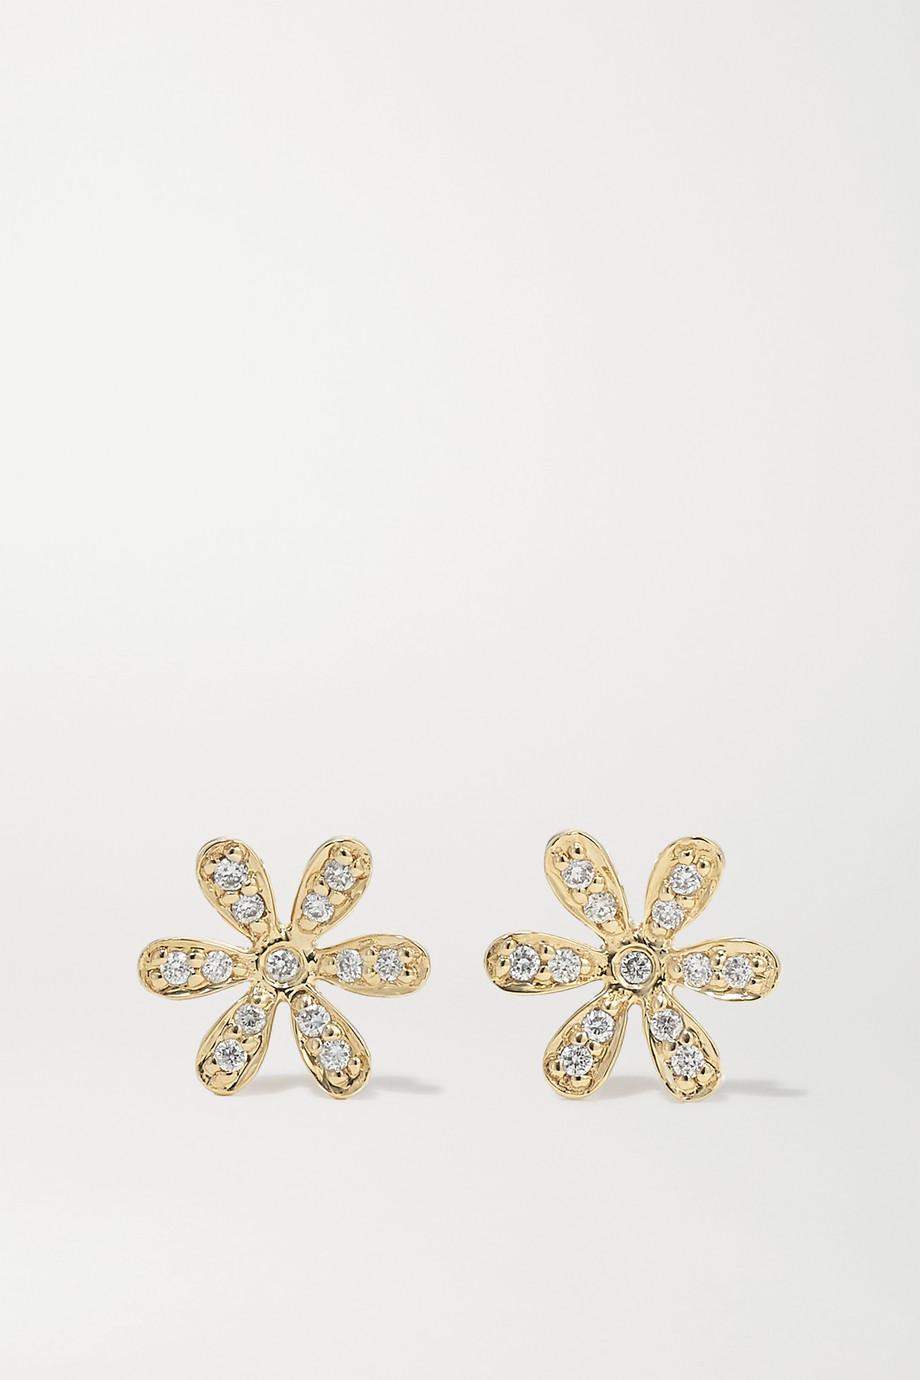 Sydney Evan Baby Daisy 14-karat gold diamond earrings